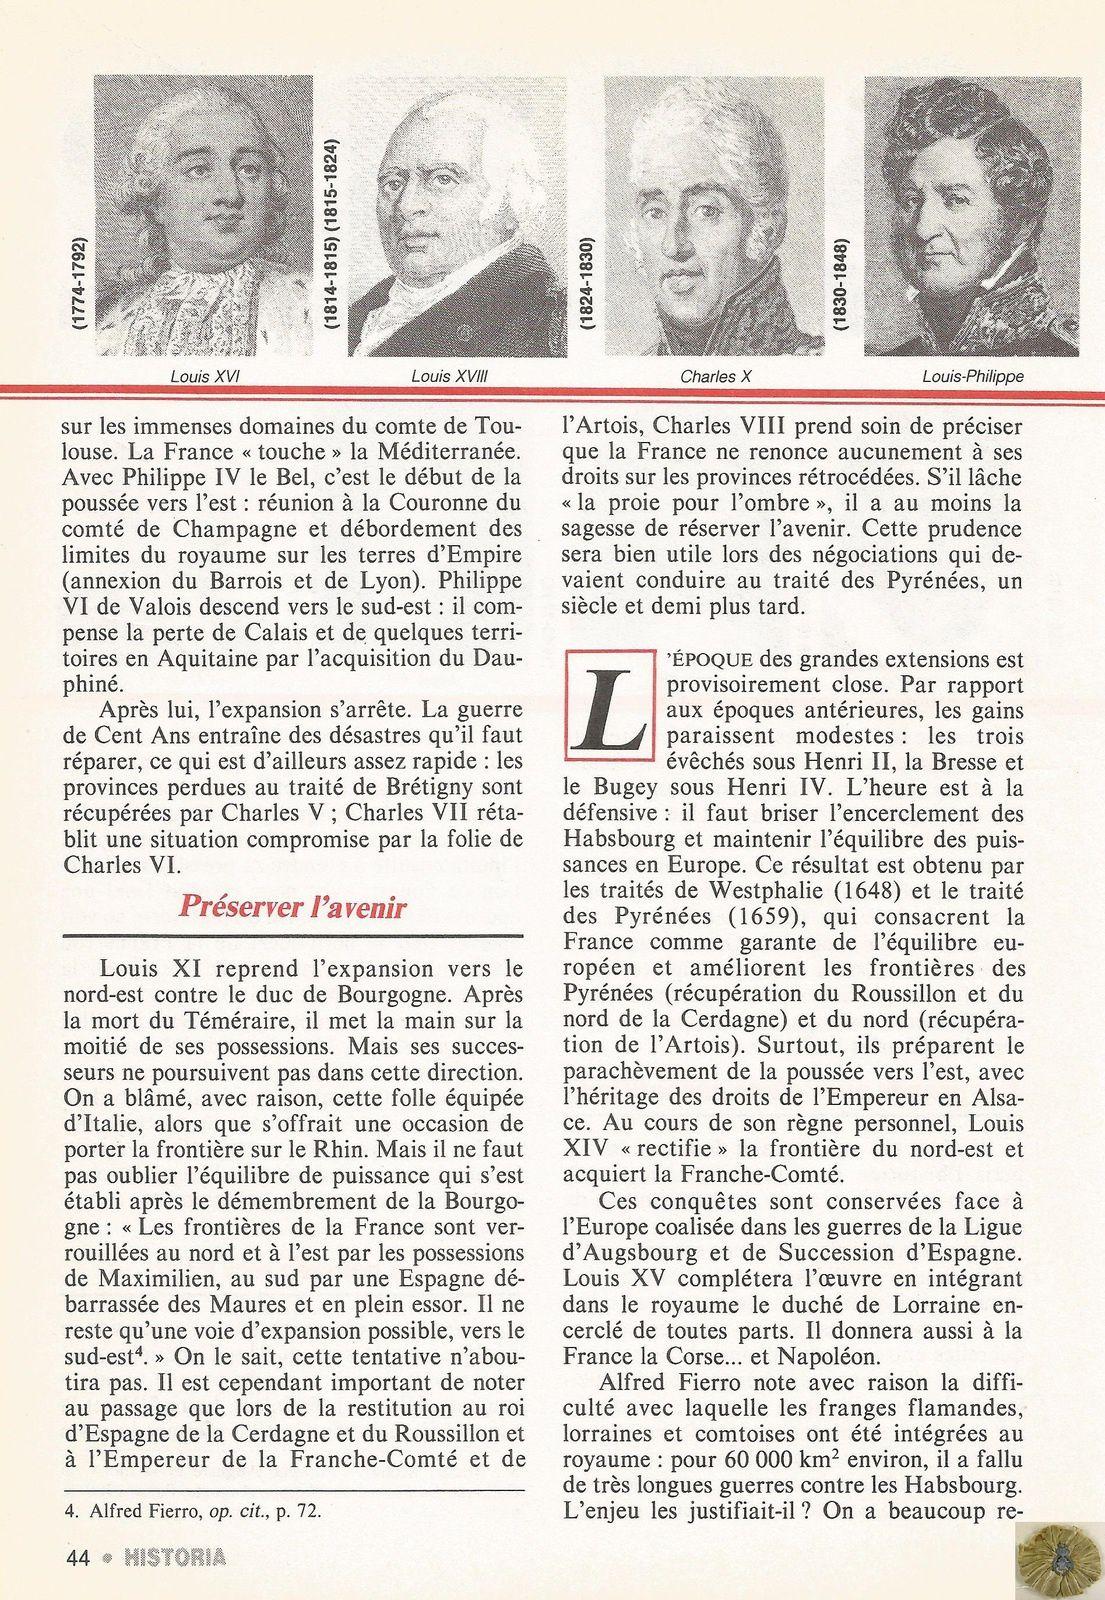 HISTORIA NUMÉRO 487 - JUILLET 1987